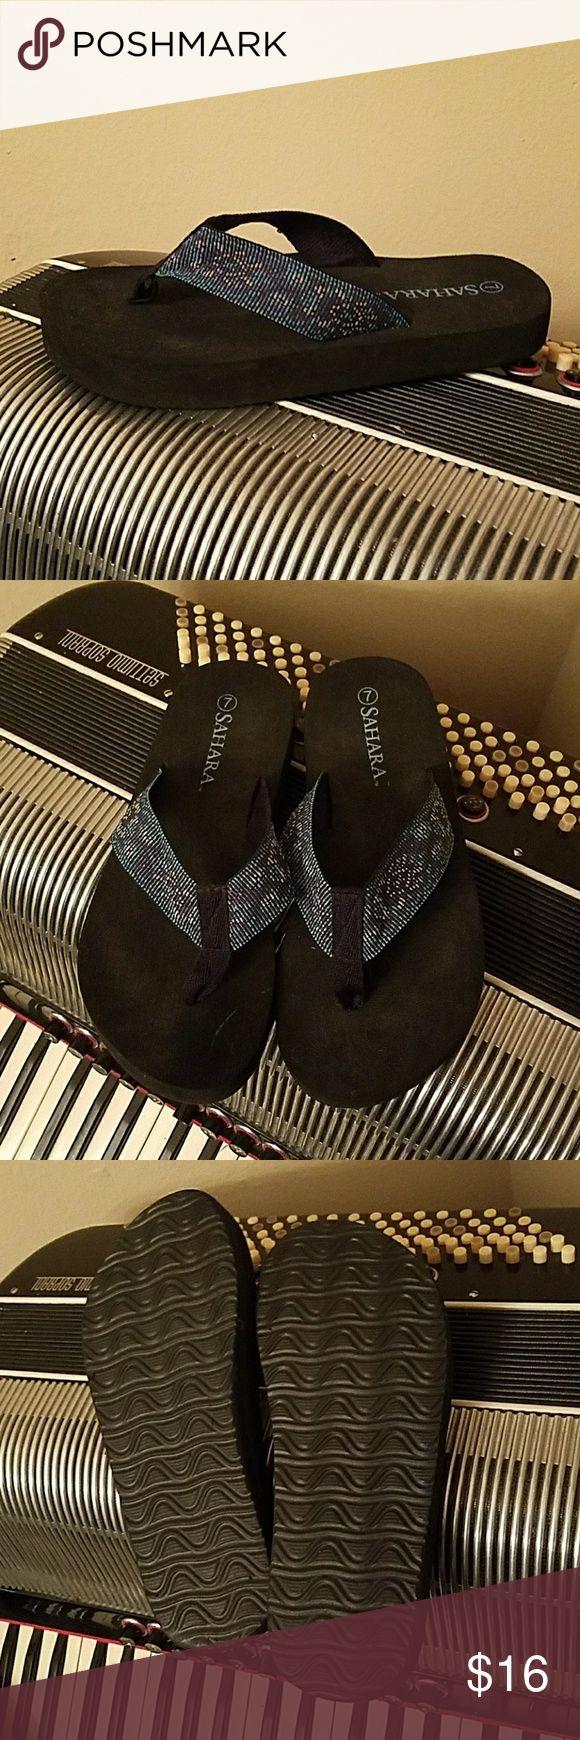 NWOT-SAHARA NAVY BLUE & BLK FABRIC FLIP FLOPS NWOT-SAHARA NAVY BLUE & BLK FABRIC FLIP FLOPS.  Size 7 sahara Shoes Sandals